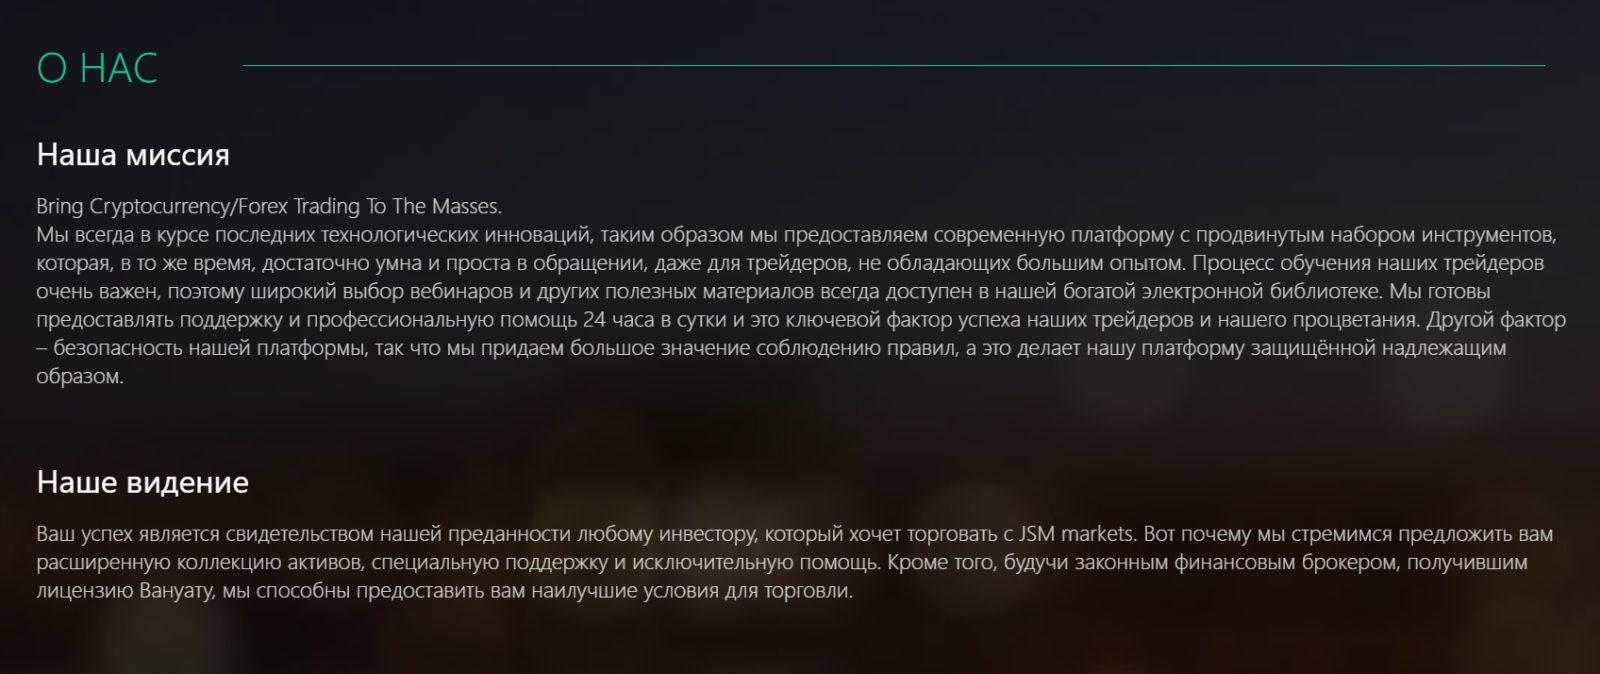 Миссия компании JSM markets